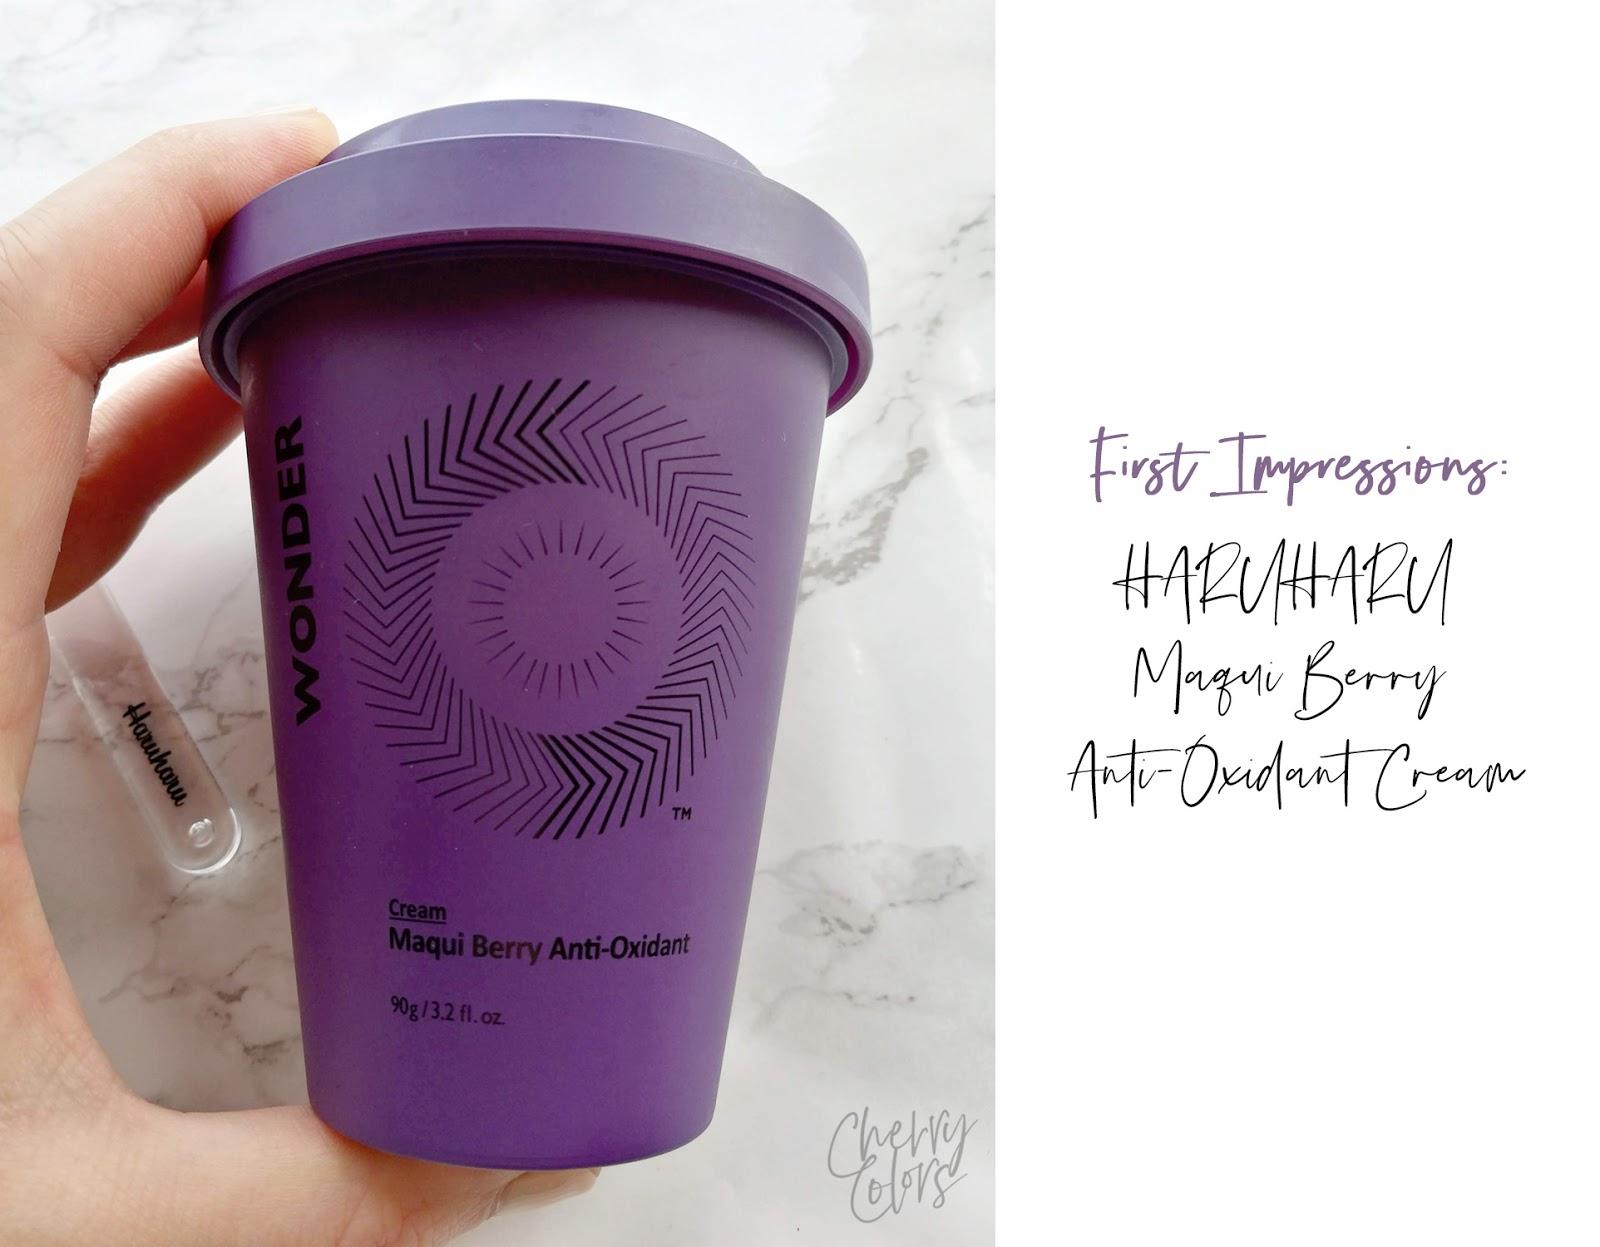 HARUHARU Wonder Berry Anti-Oxidant Cream